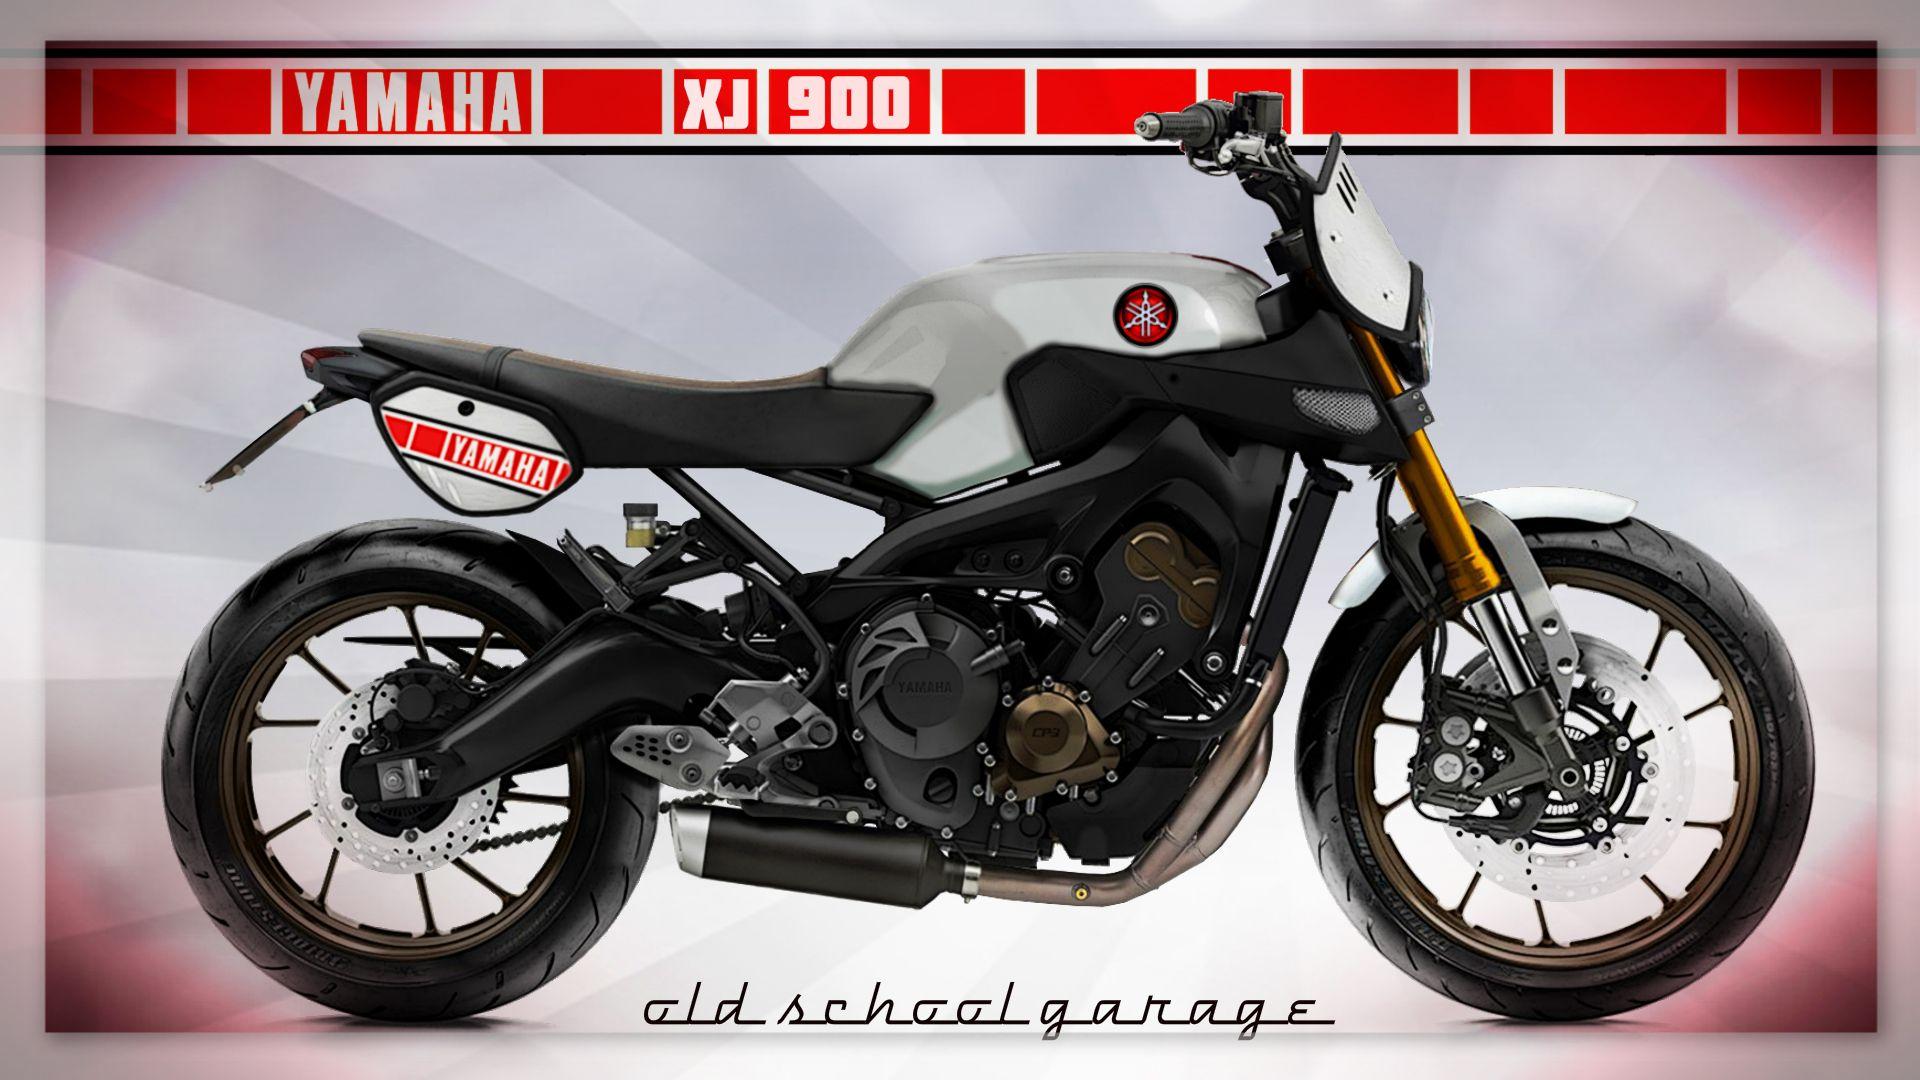 Moto yamaha scrambler cars motorcycles bobber forward mt09 yamaha - Yamaha Fz 9 Mt 09 Special Motorcycles Virtual Projects Pinterest Tracker Motorcycle Custom Motorcycles And Wheels